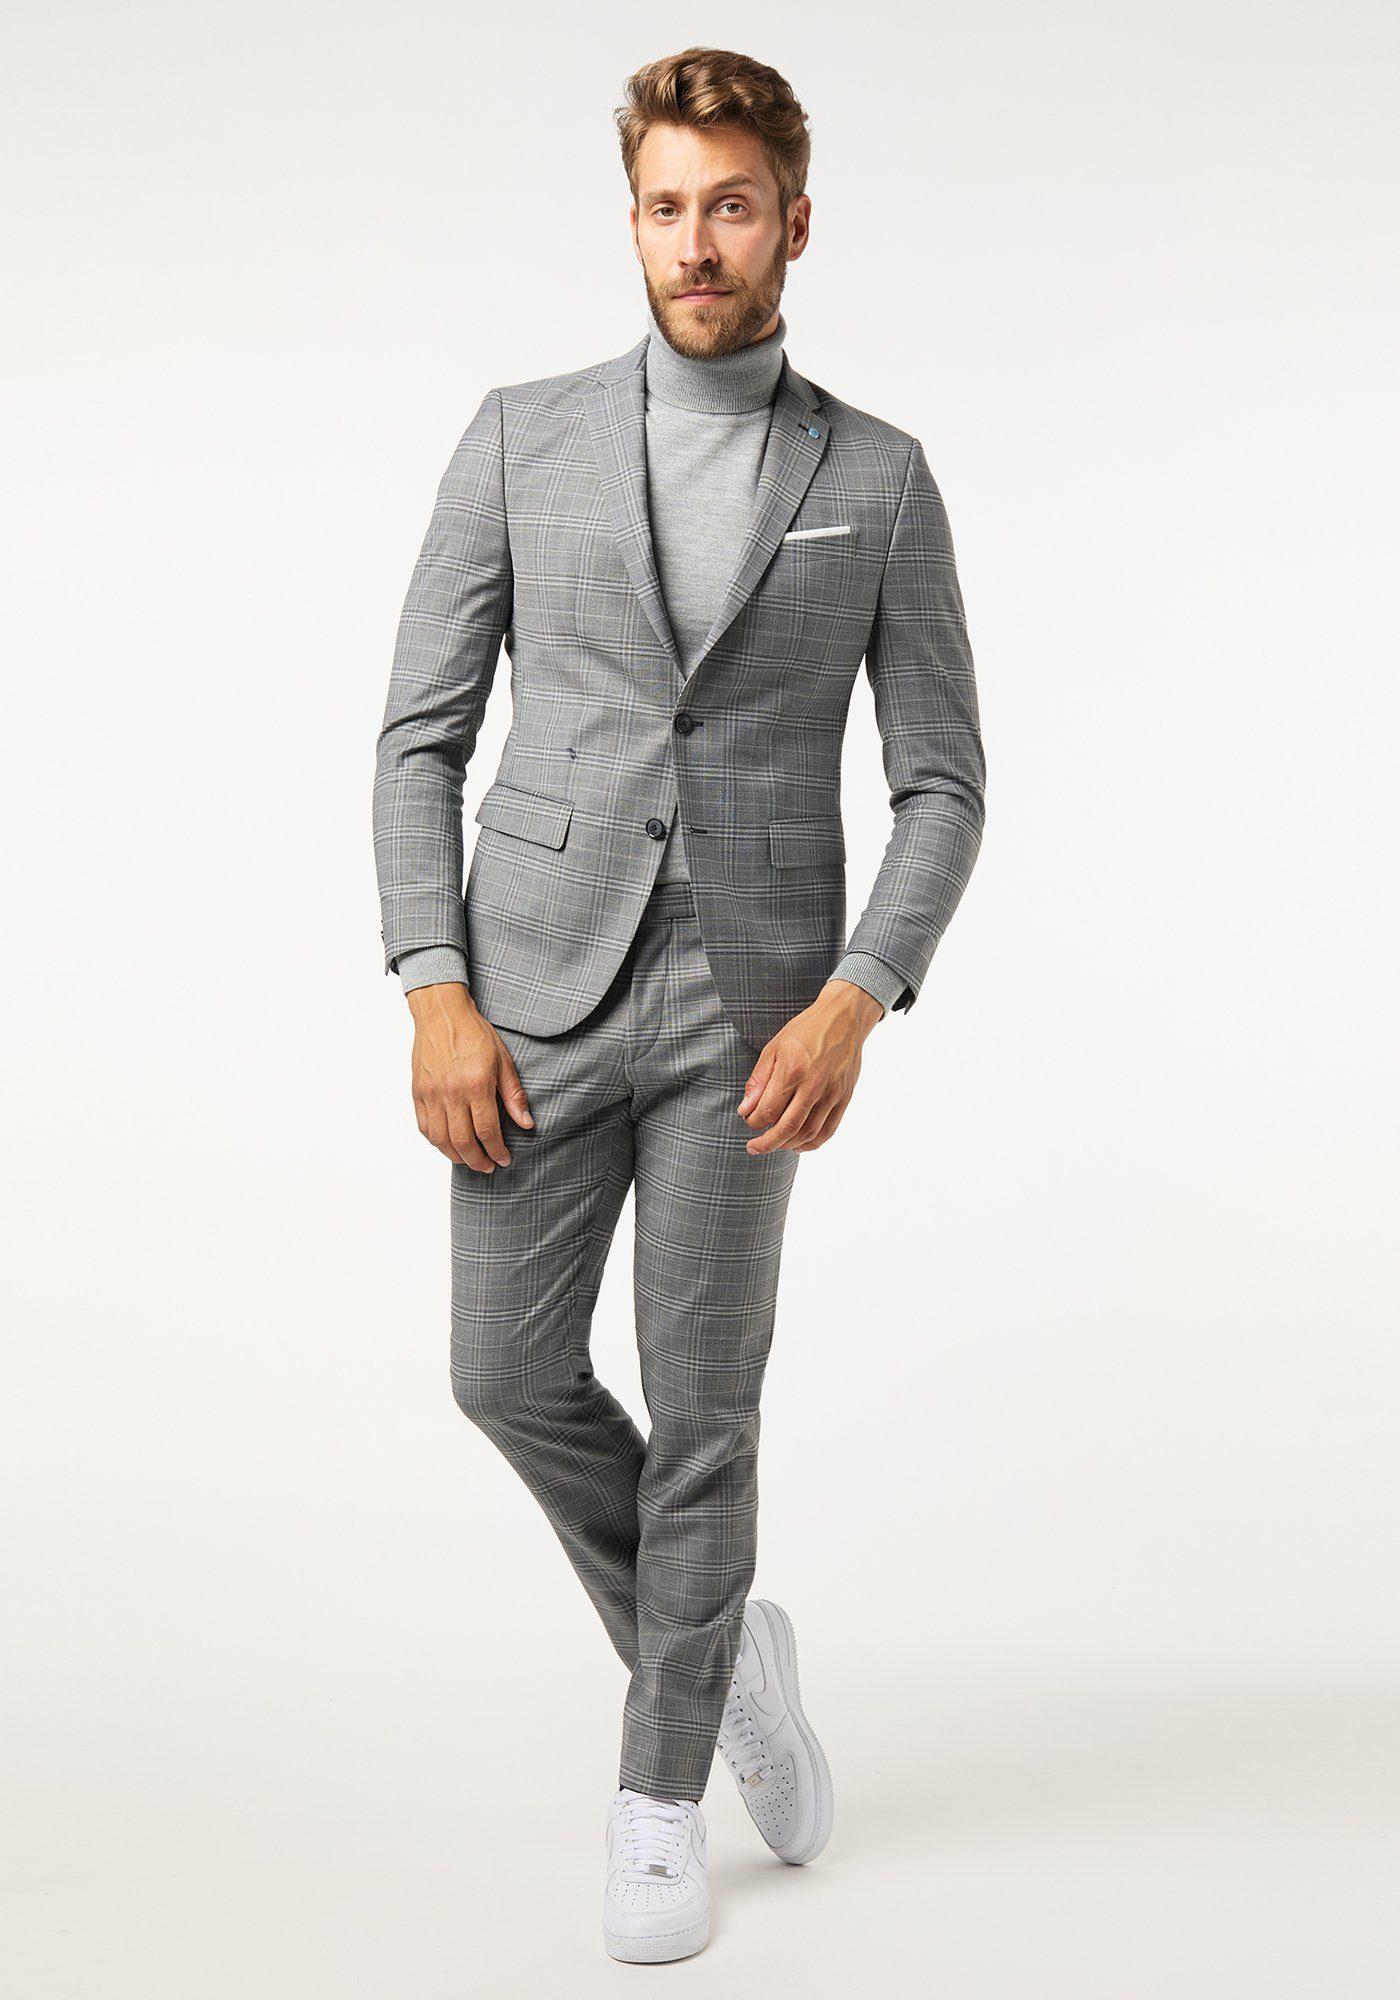 Zakelijke outfit coltrui grijs